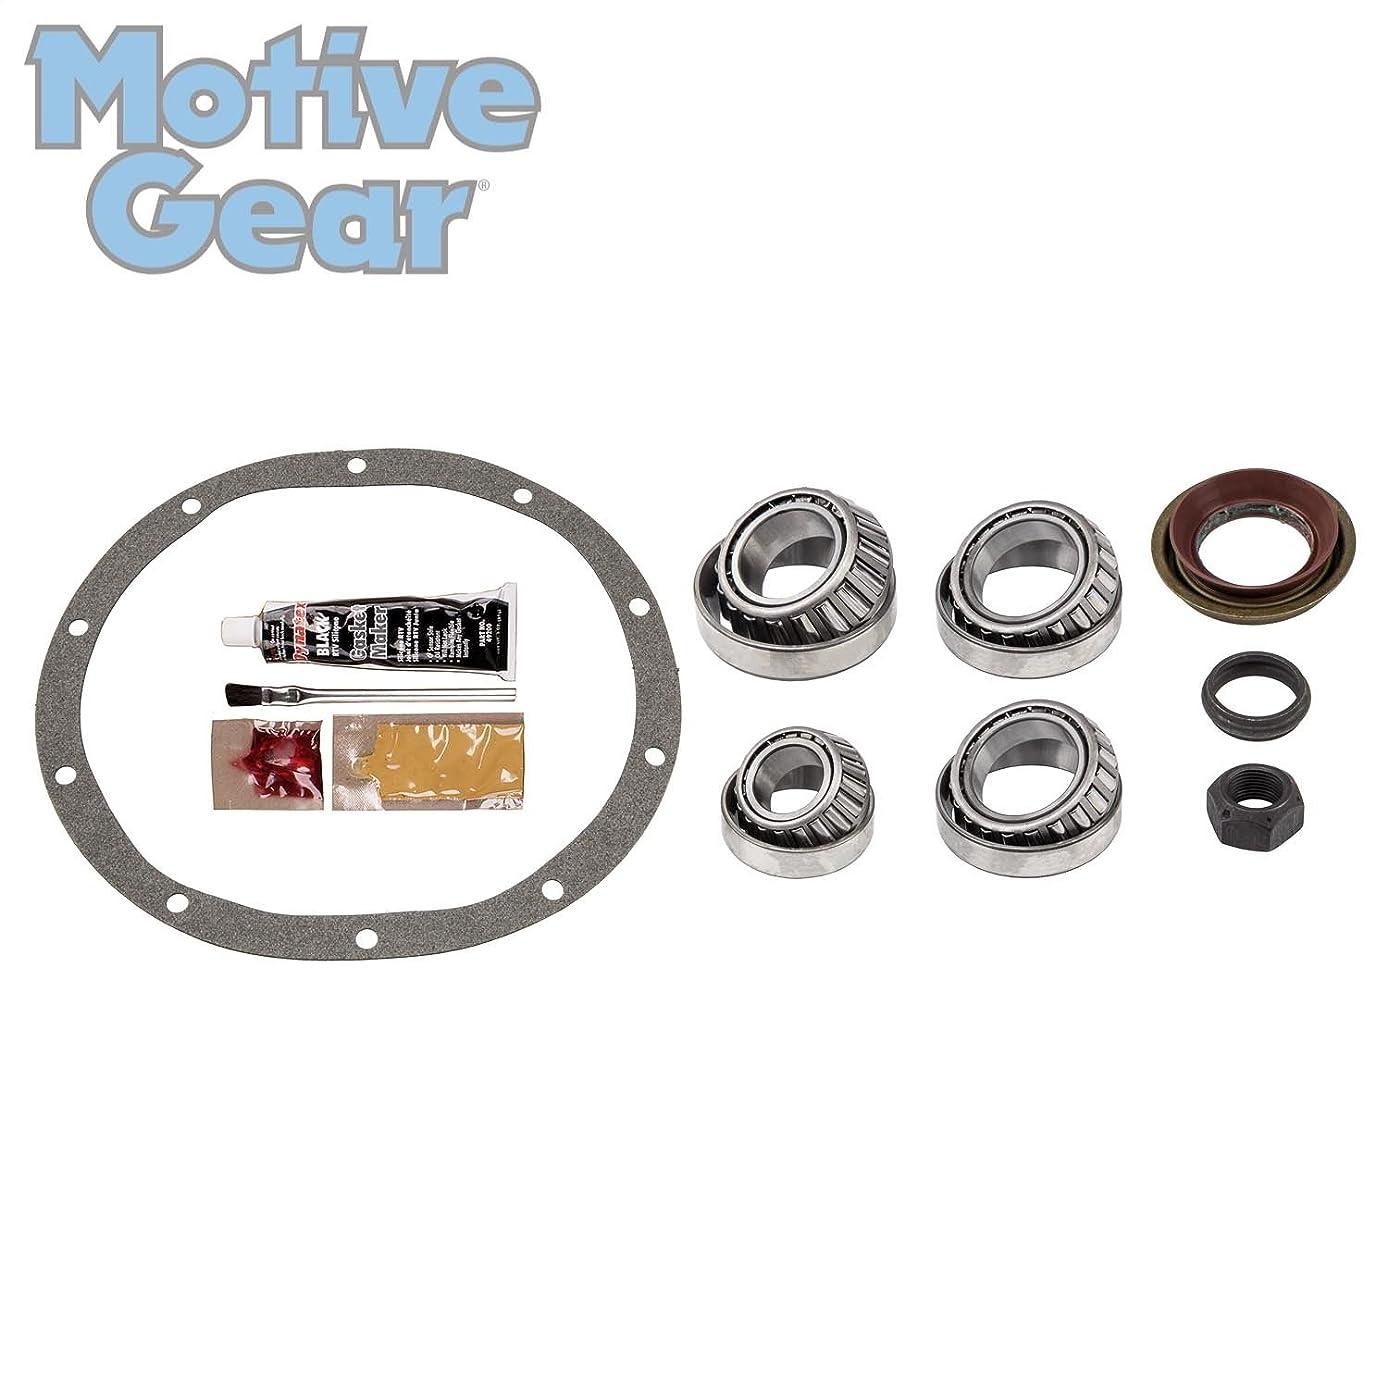 Motive Gear R8.25RJT Light Duty Koyo Bearing Kit (BK Chrysler 8.25